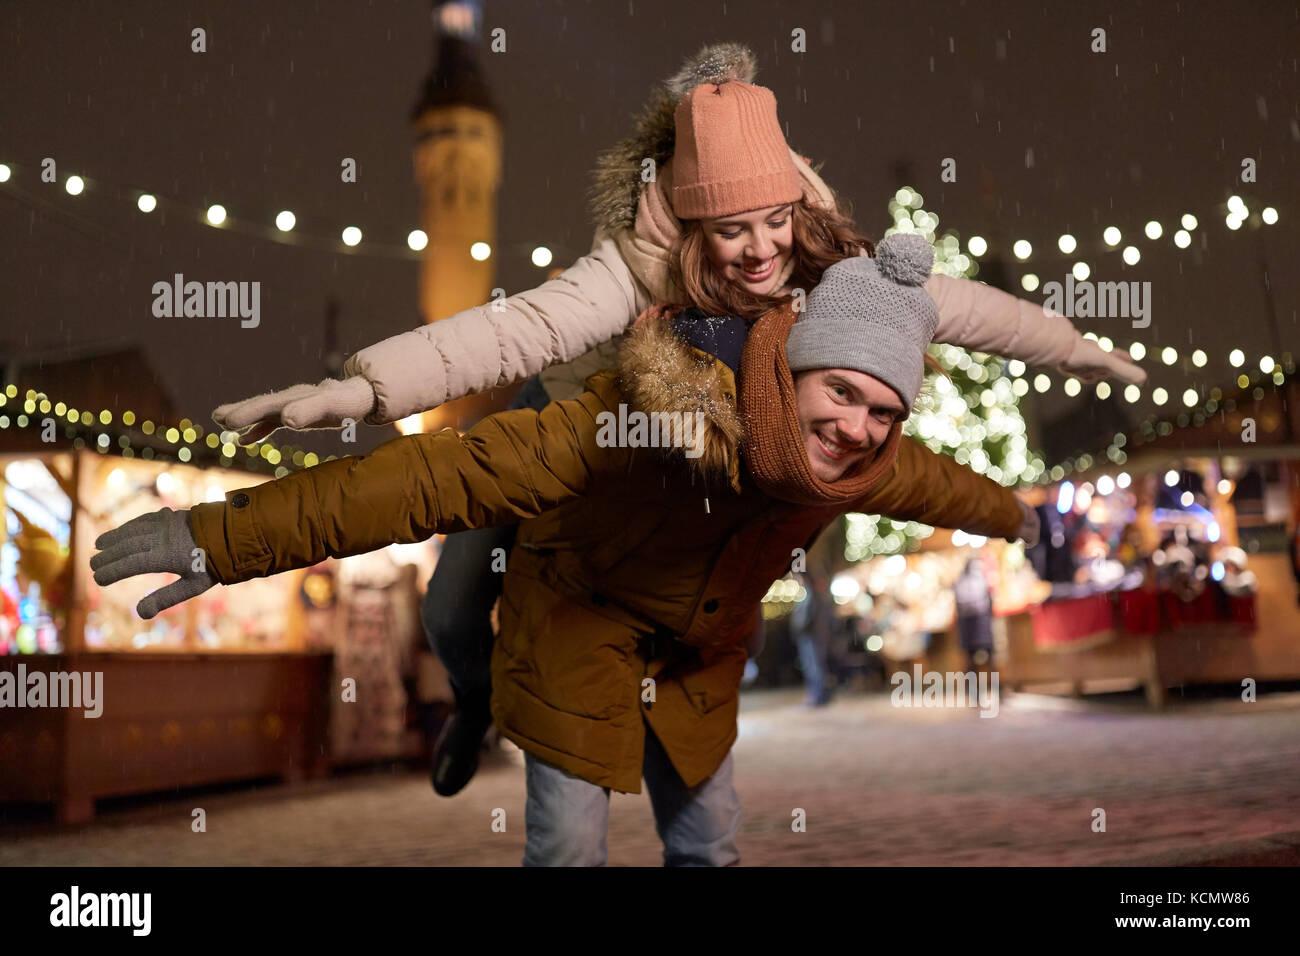 happy couple having fun at christmas market - Stock Image